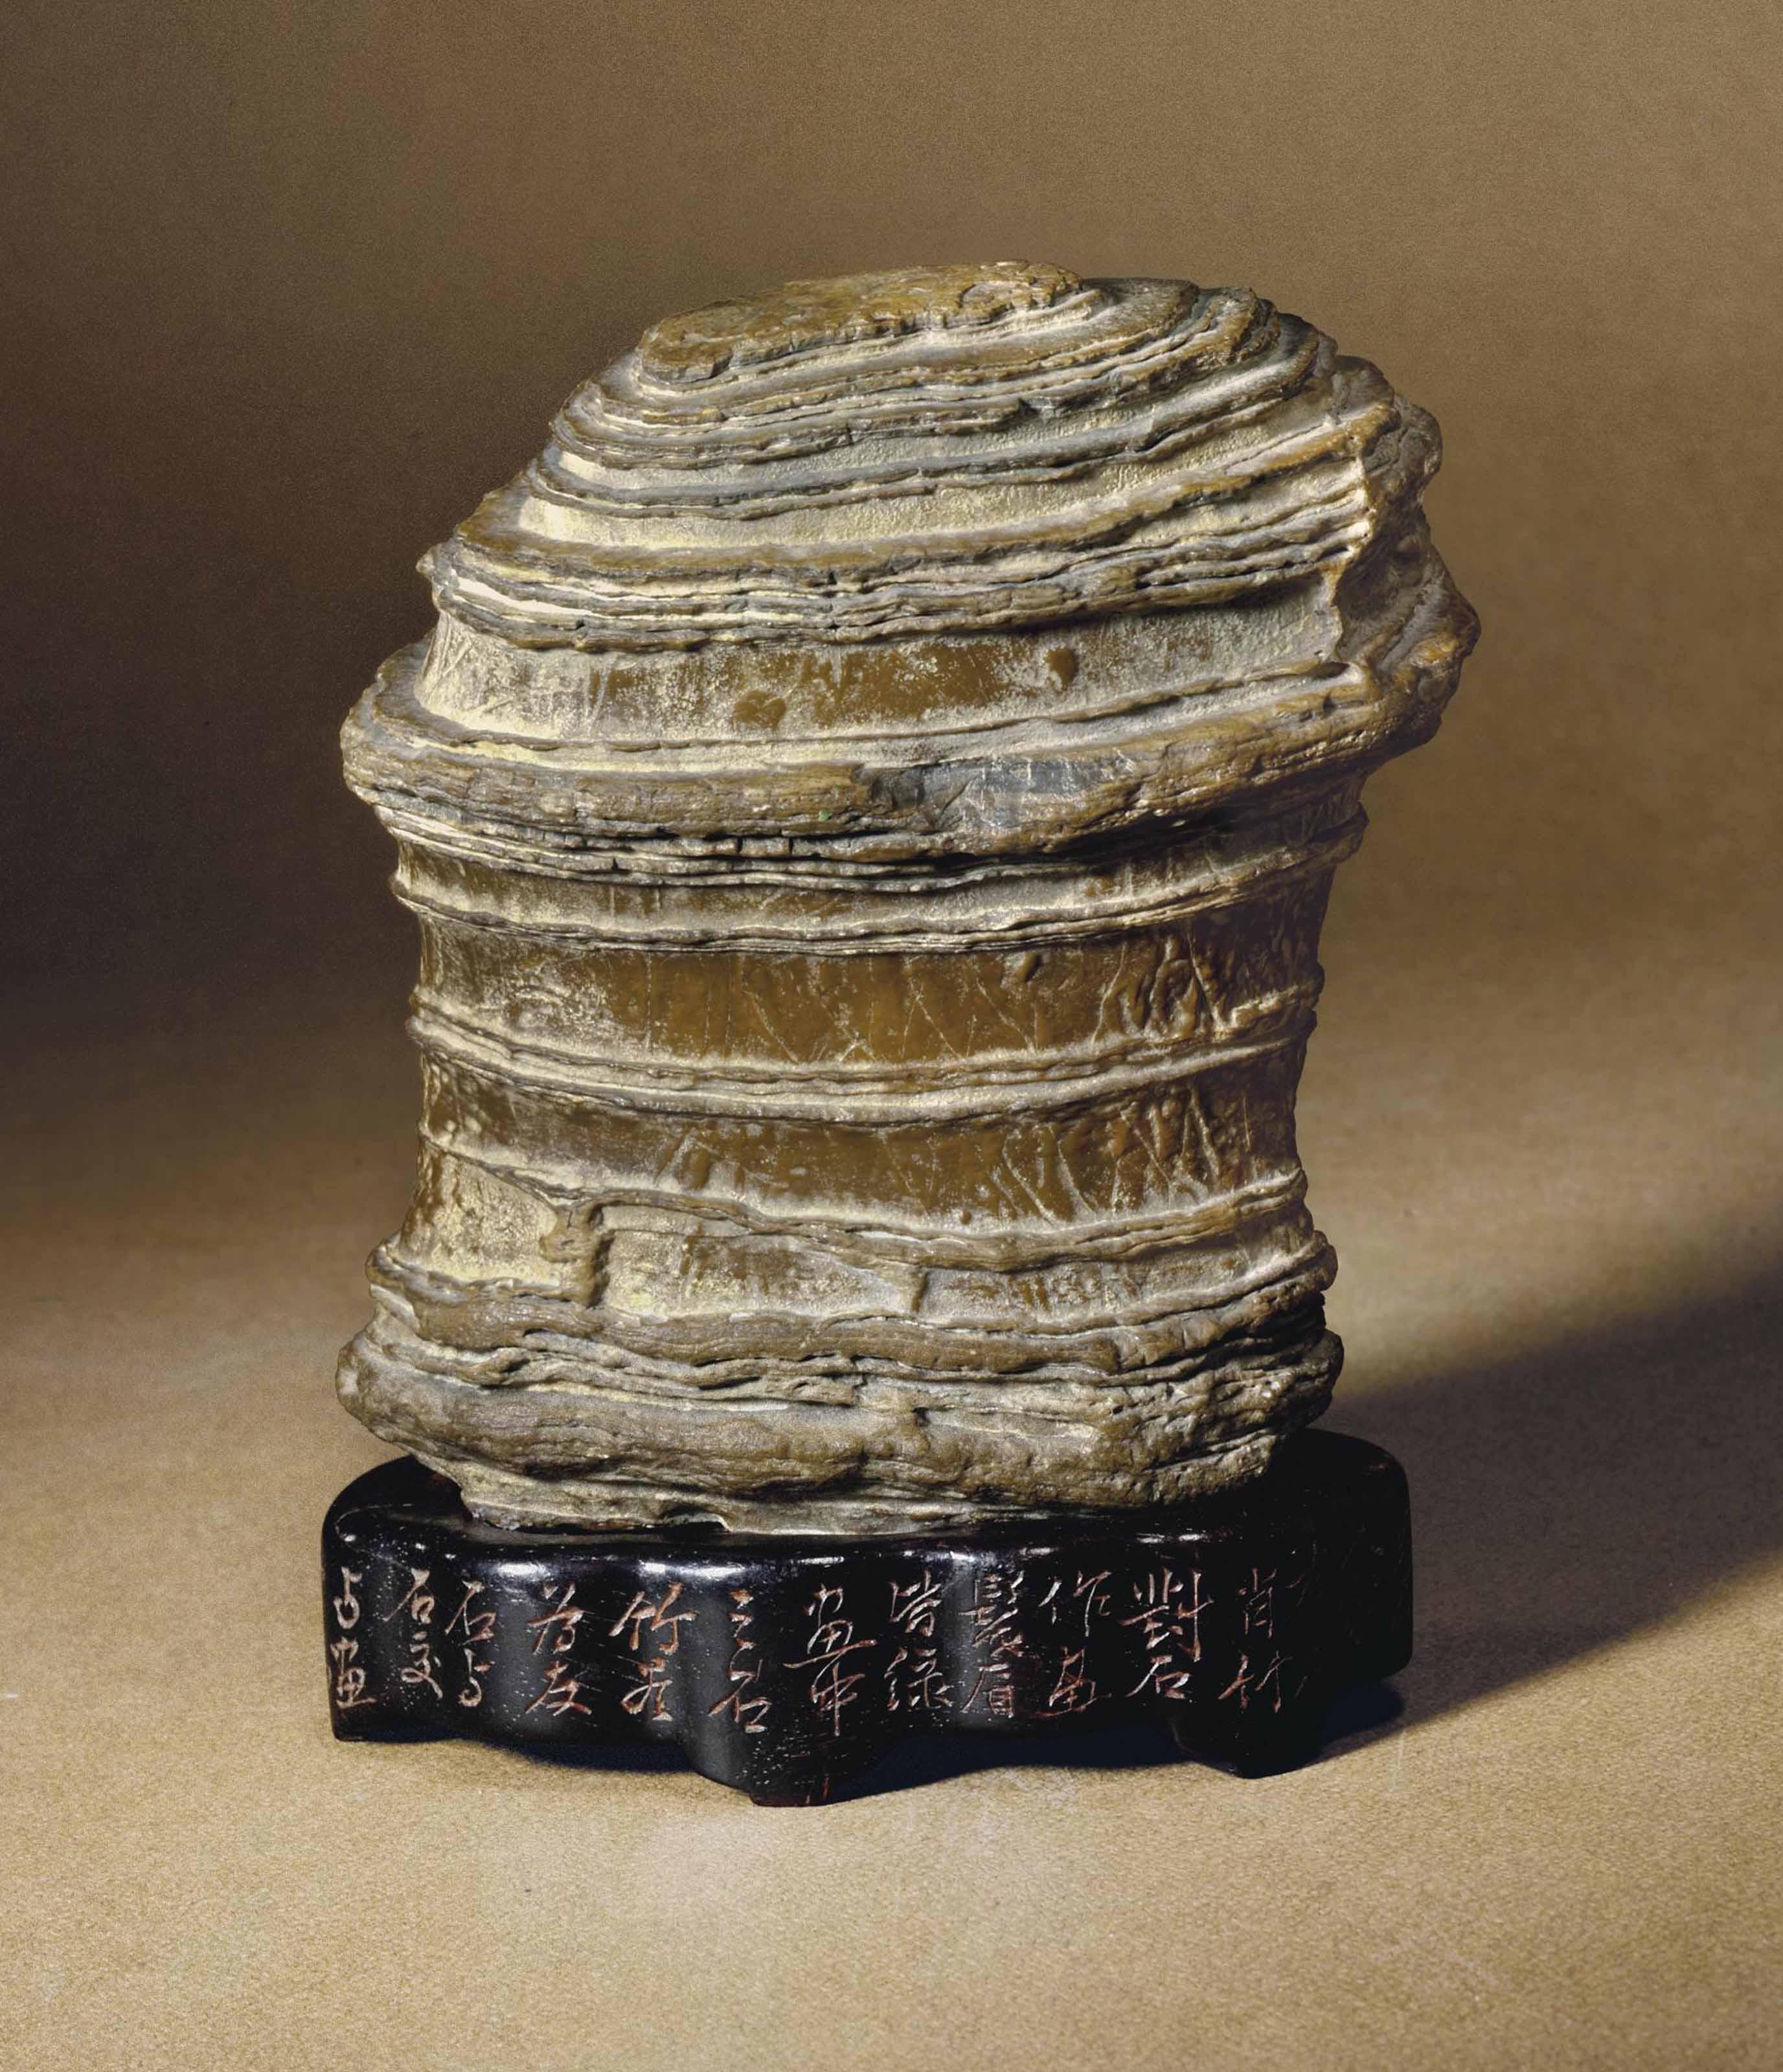 A LIMESTONE SCHOLAR'S ROCK